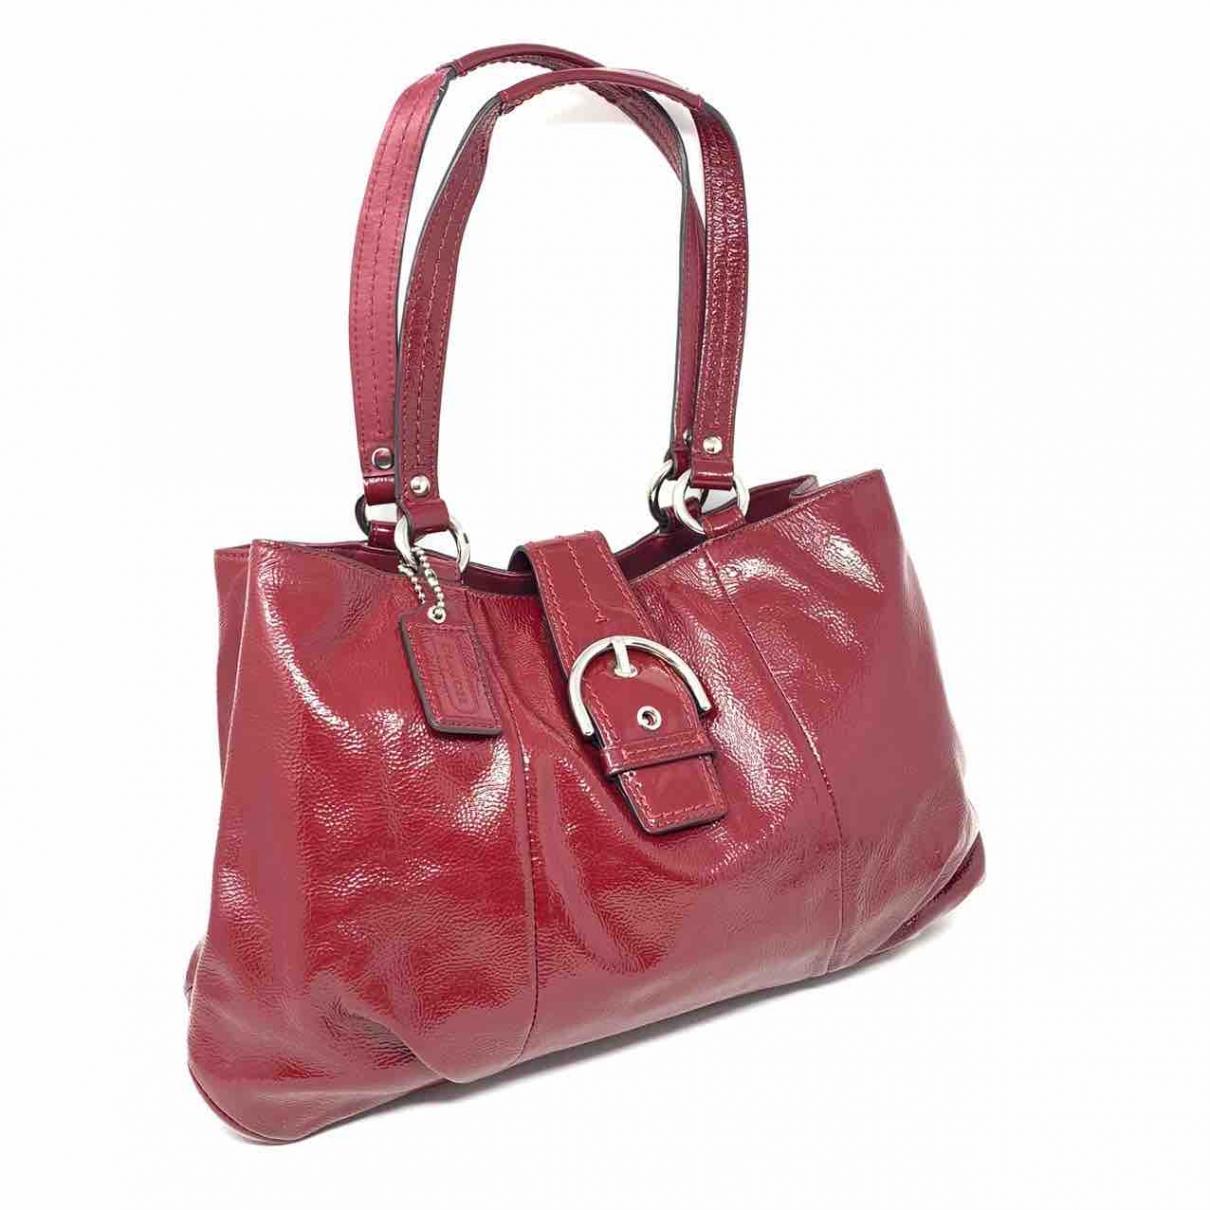 Coach \N Handtasche in  Rot Lackleder